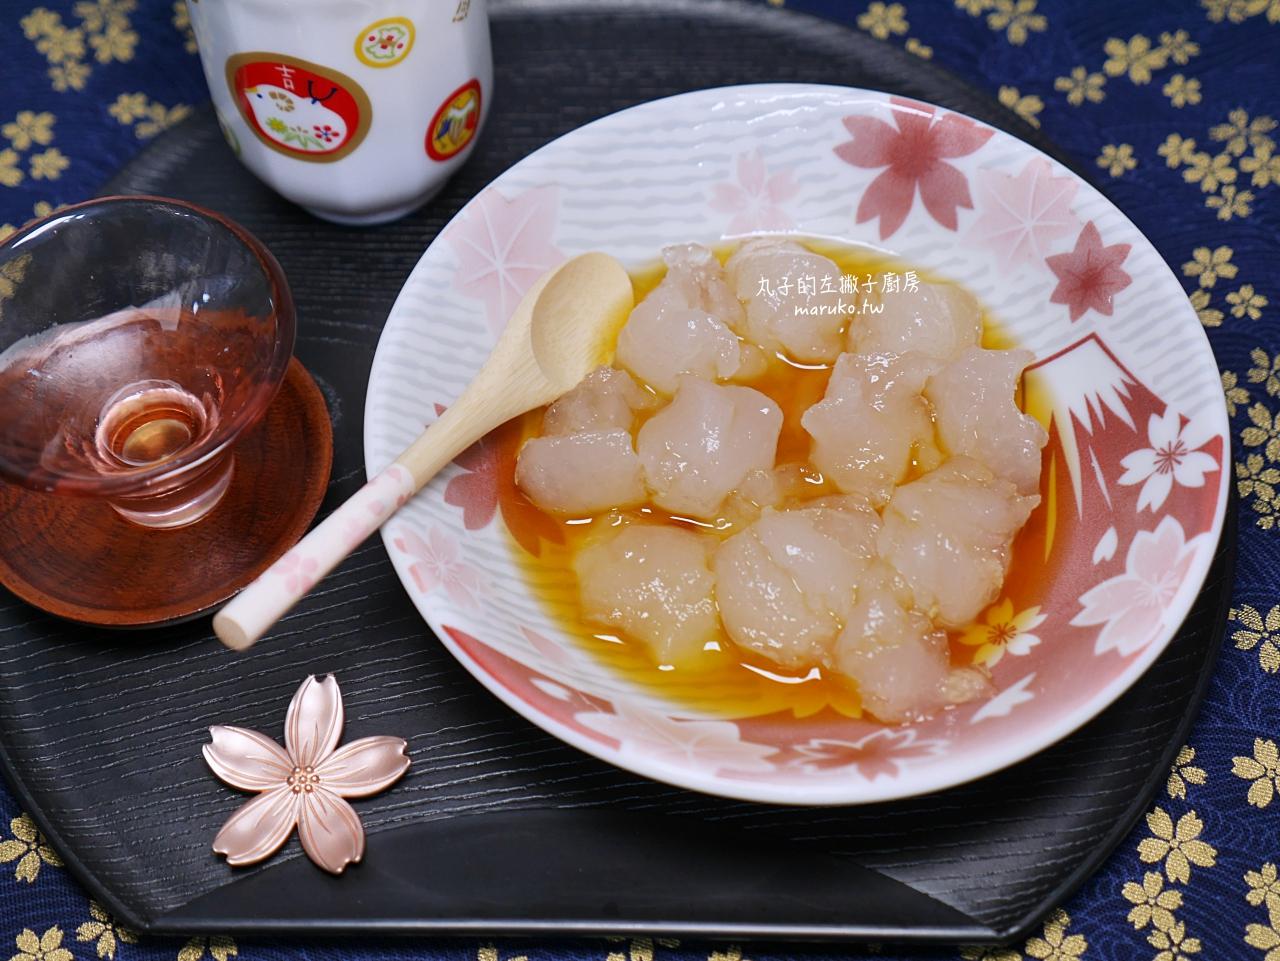 【福岡美食 】天婦羅處ひらお(hirao)|現炸天婦羅定食四種小菜無限取用 @Maruko與美食有個約會